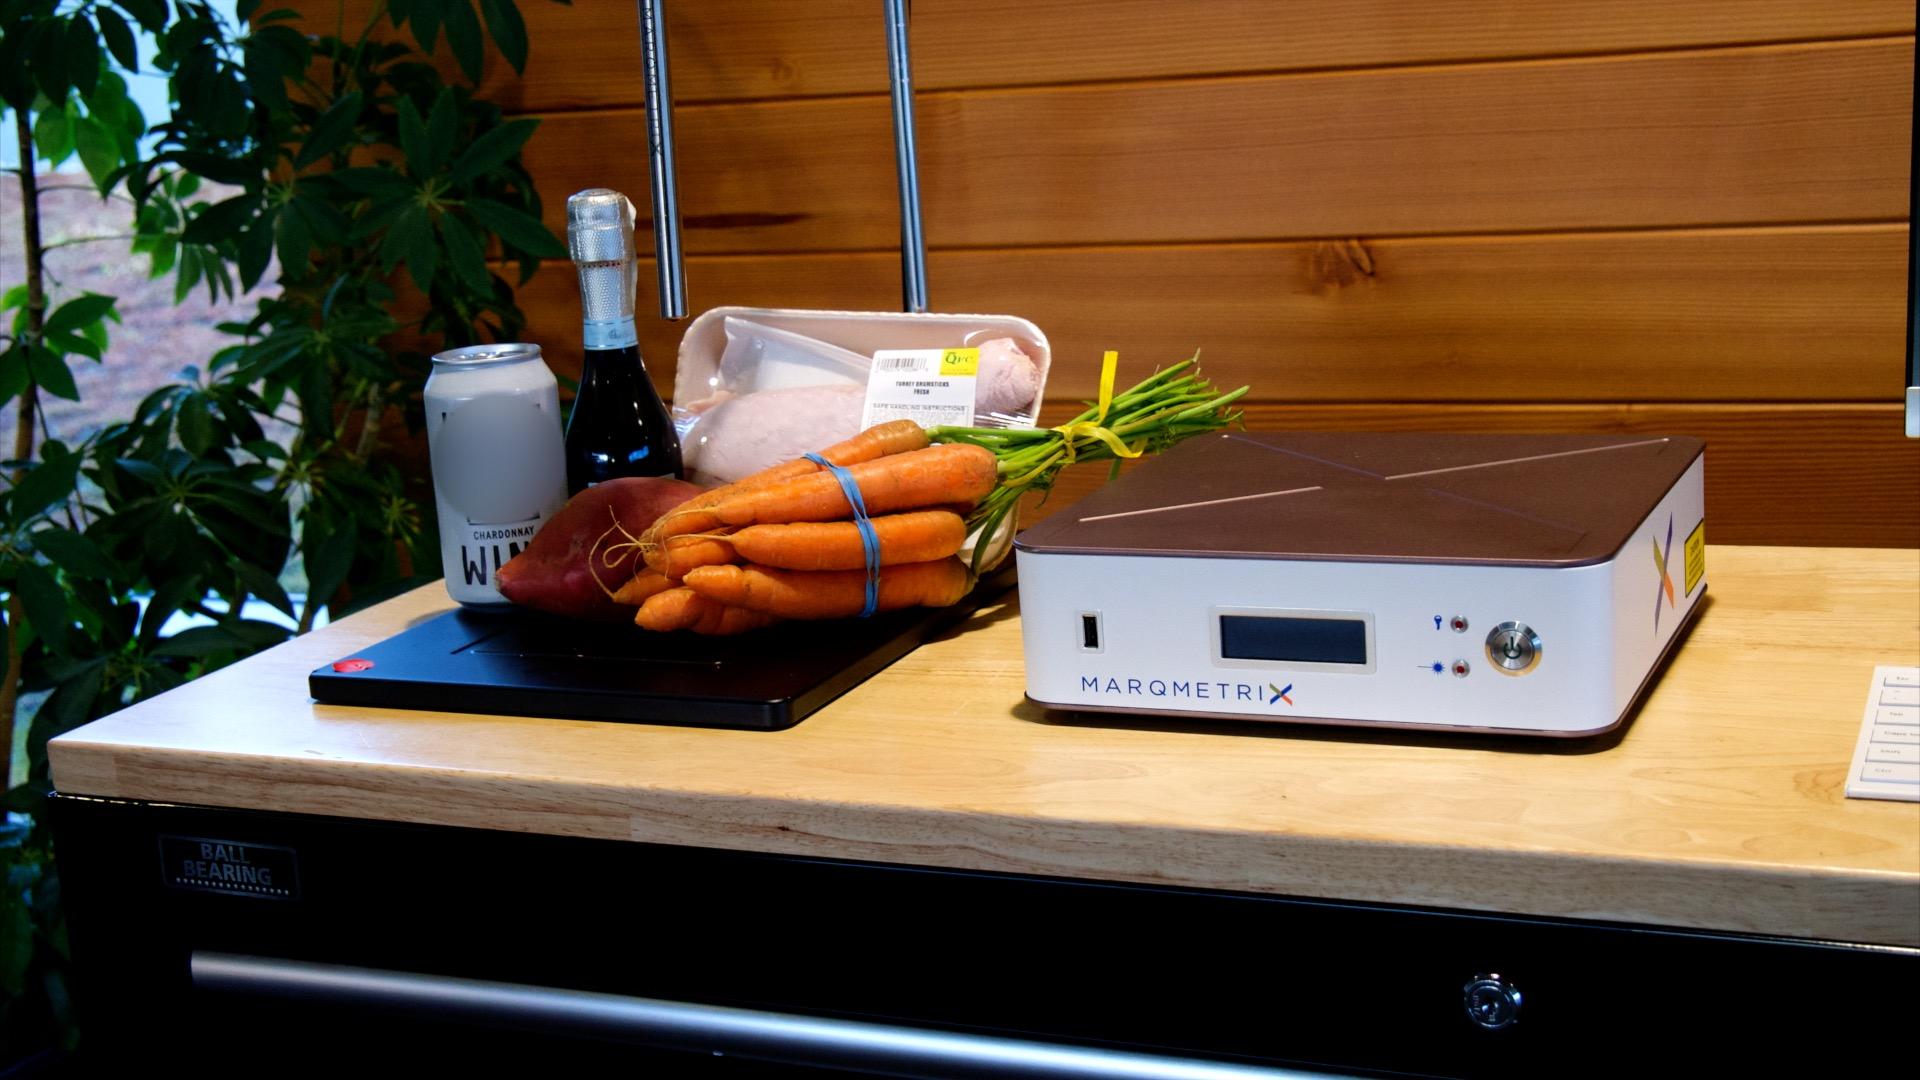 MarqMetrix Food and Beverage Applications